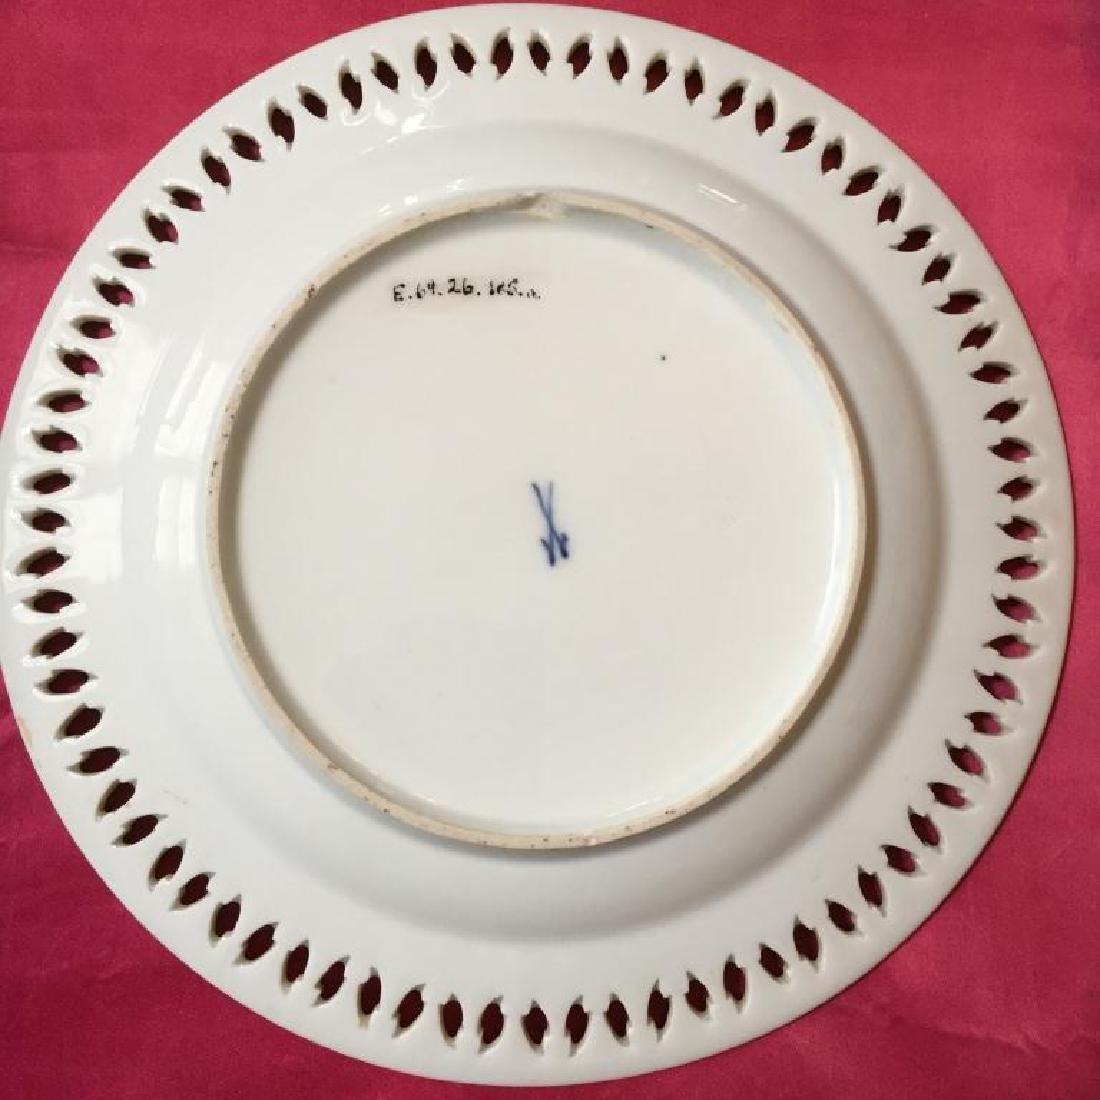 19thc German Meissen Museum Cased Plate - 3